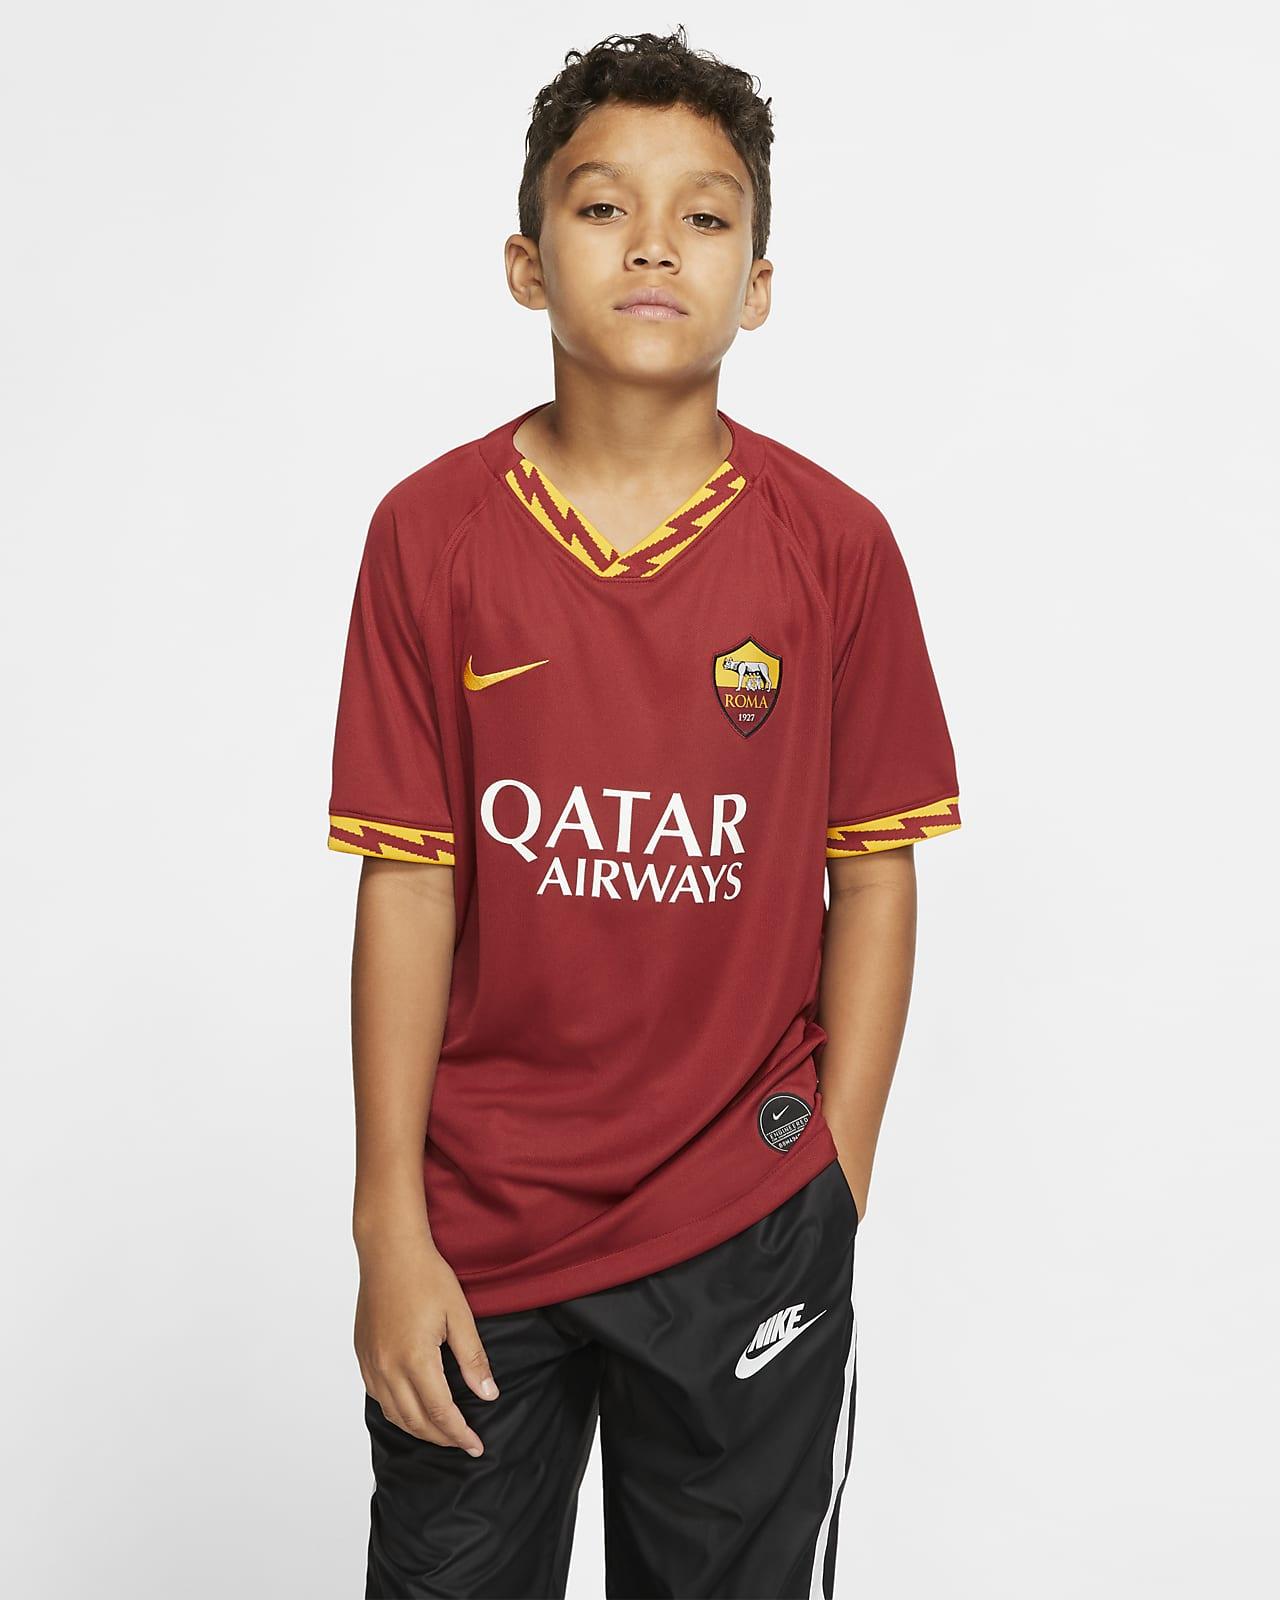 A.S. Roma 2019/20 Stadium Home Older Kids' Football Shirt